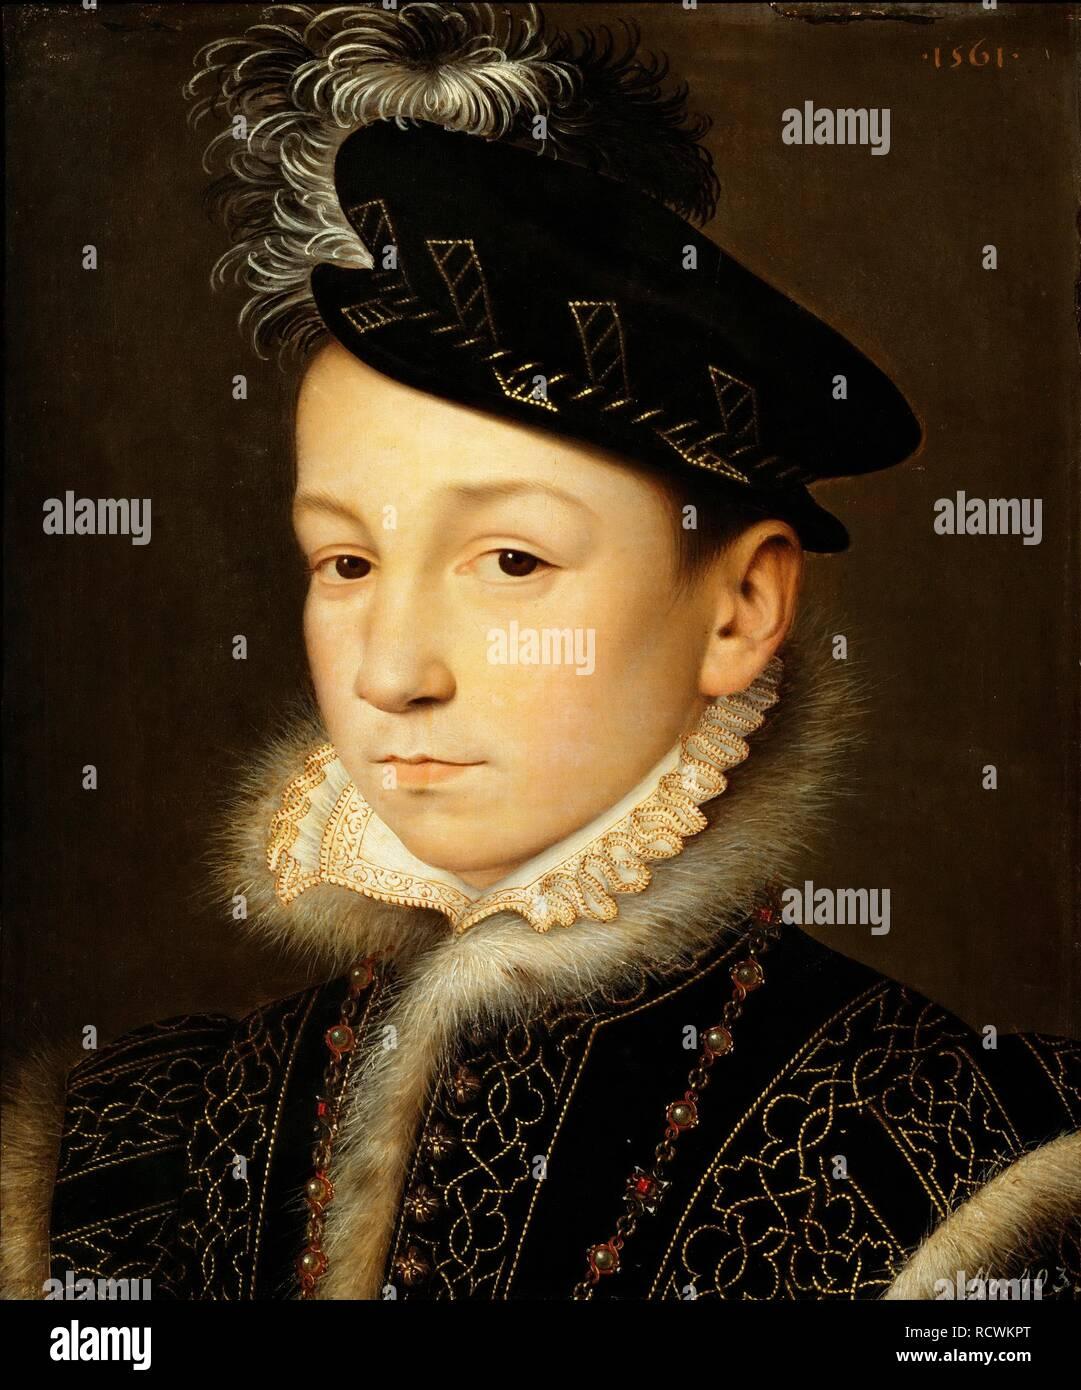 Portrait of King Charles IX of France (1550-1574). Museum: Art History Museum, Vienne. Author: CLOUET, FRANÇOIS. Stock Photo